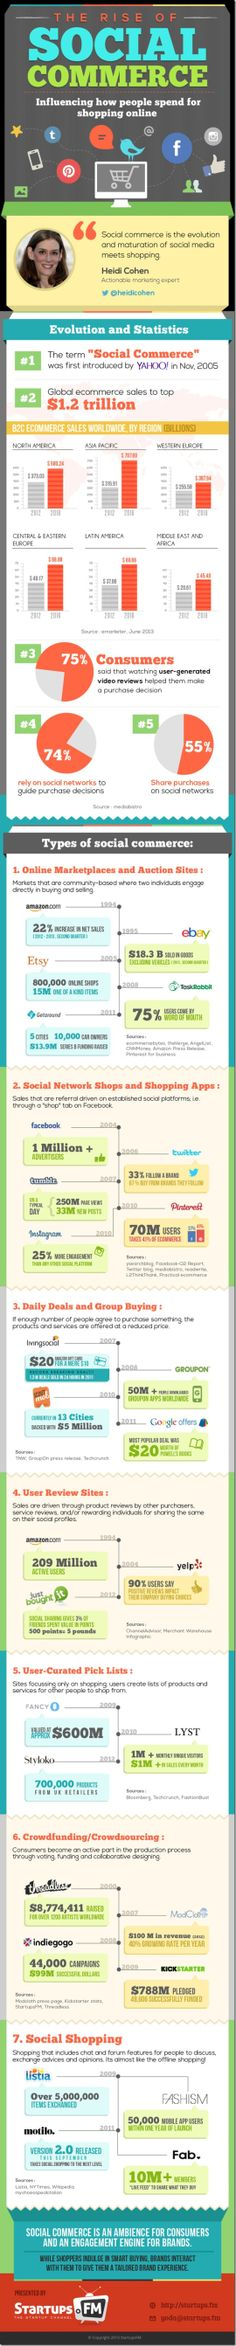 Social commerce : définition et évolution via @@Yanyan Bernardo Gourvennec